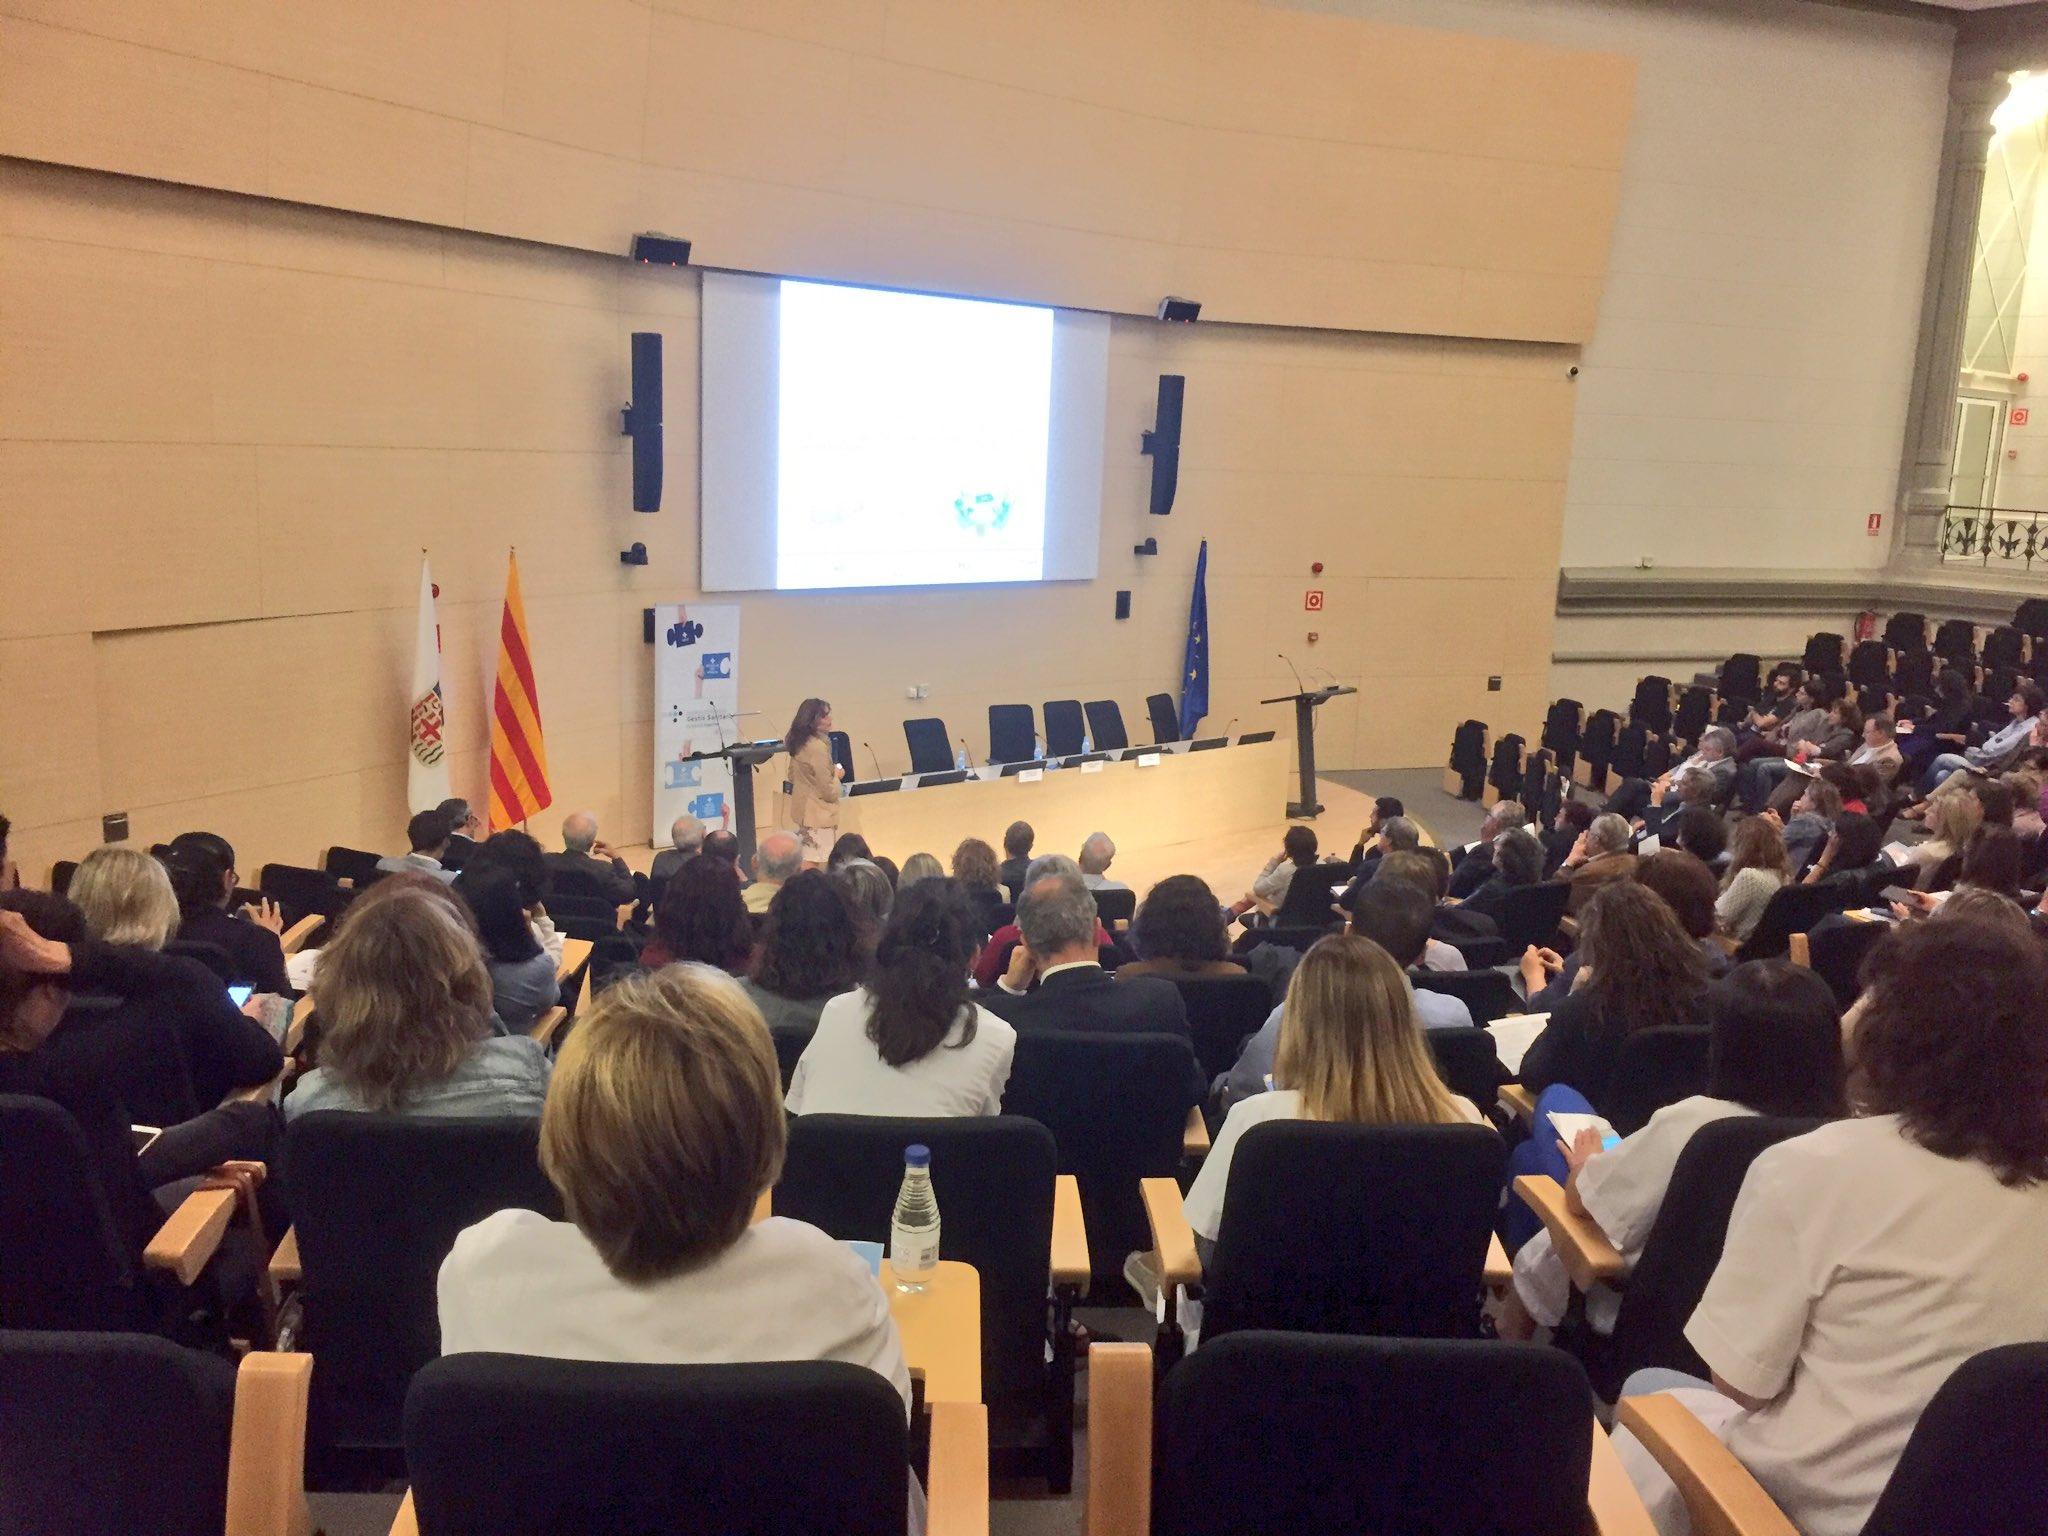 Immaculada de Molina presenta el proyecto de #decisionescompartidas en reconstrucción mamaria postmastectomía Hospital Joan XXIII https://t.co/TJgXSSL5xg